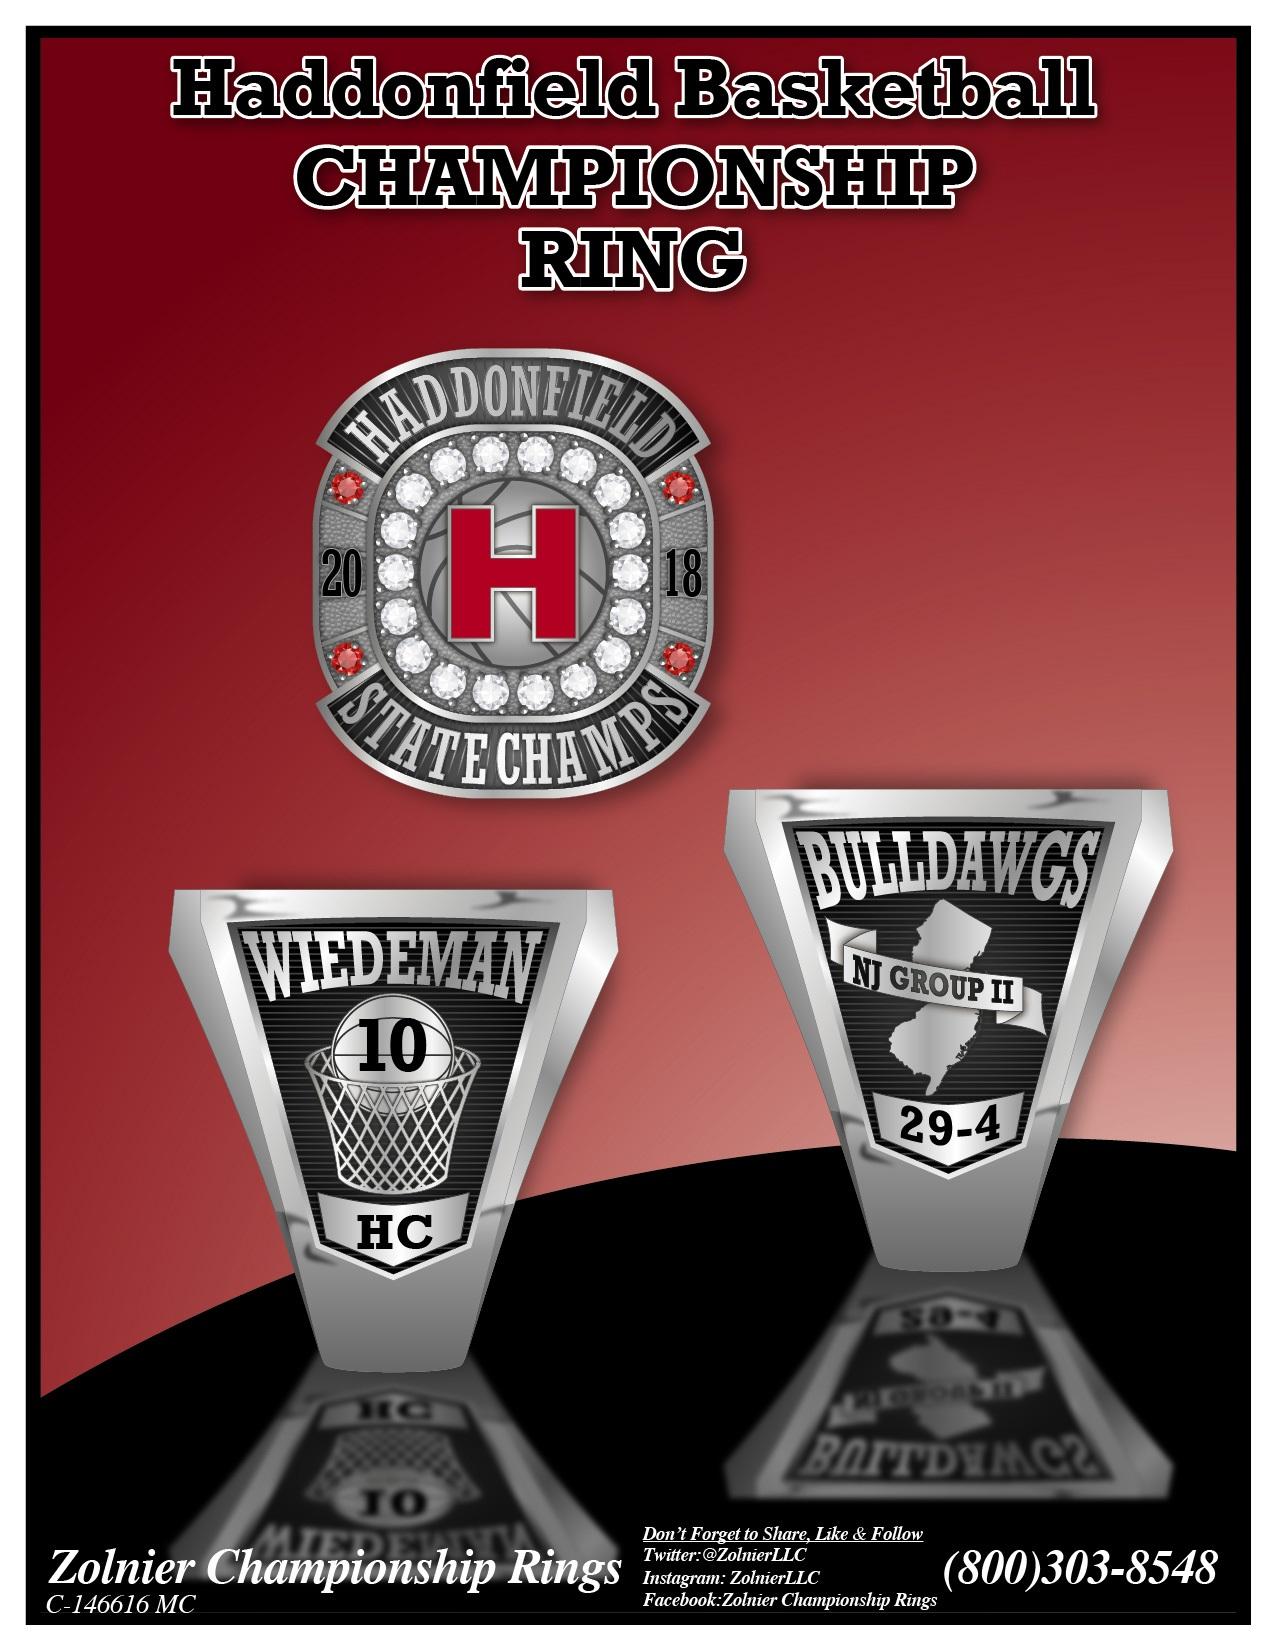 C-146616 Haddonfield Memorial Basketball Champ Ring